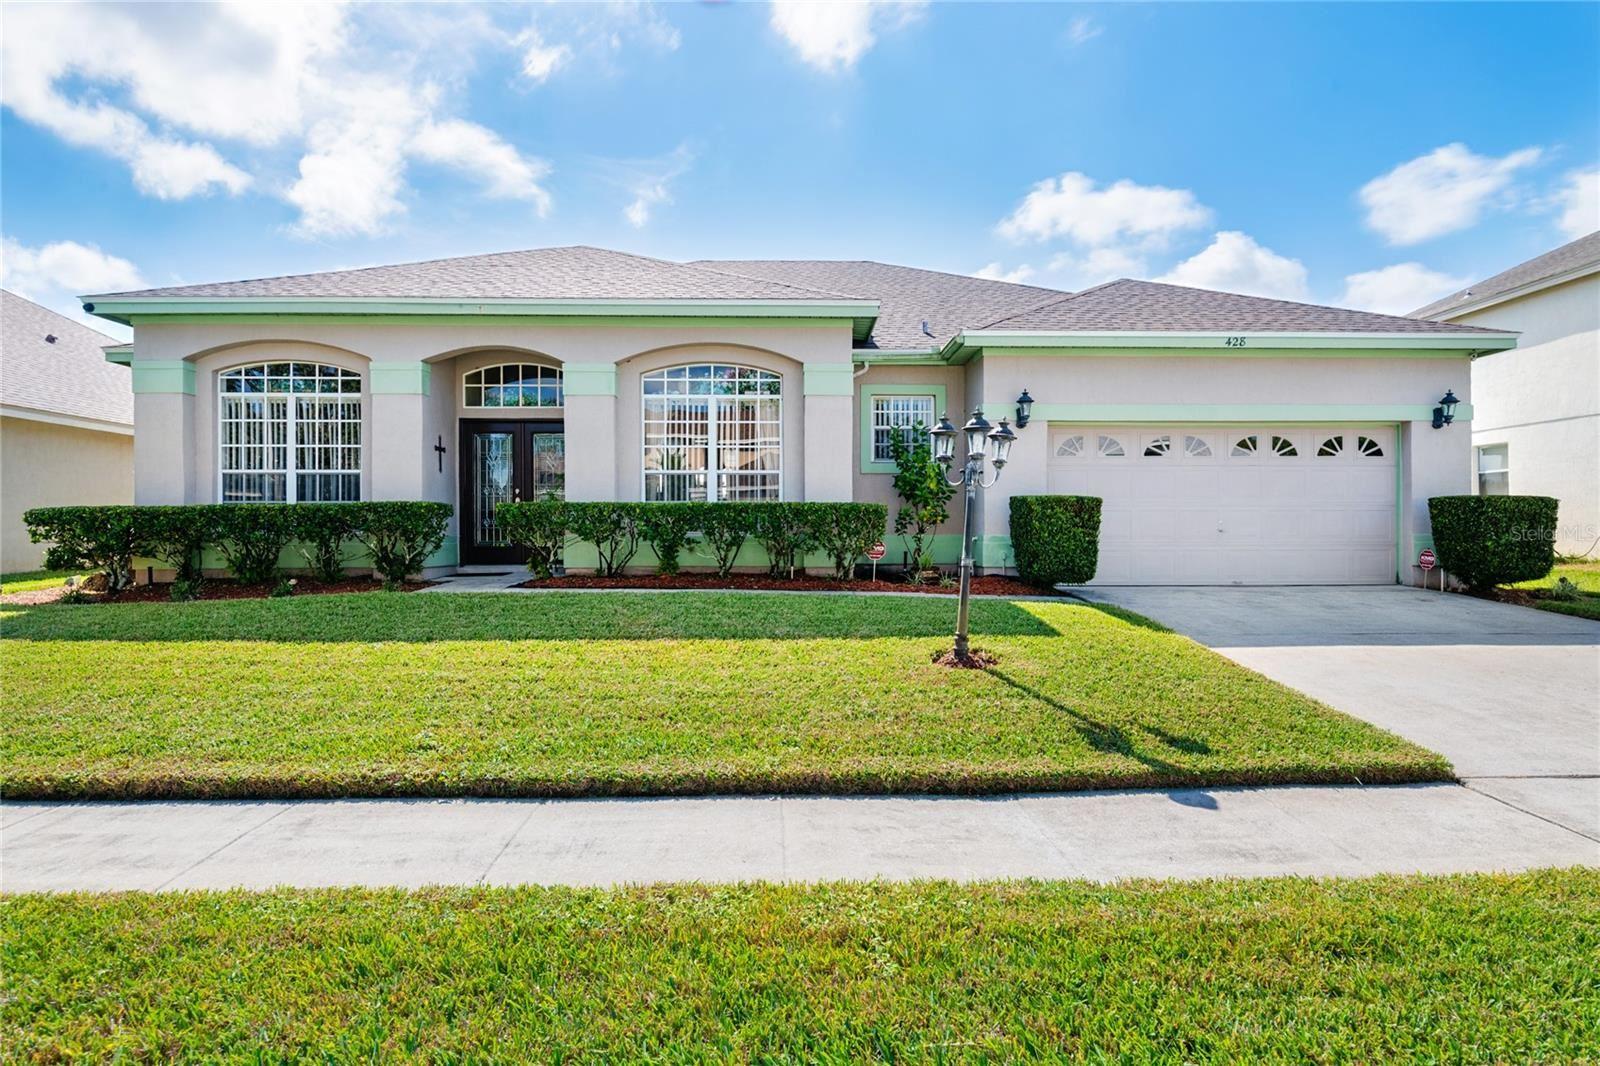 428 KNIGHT LAND COURT, Orlando, FL 32824 - #: O5973169